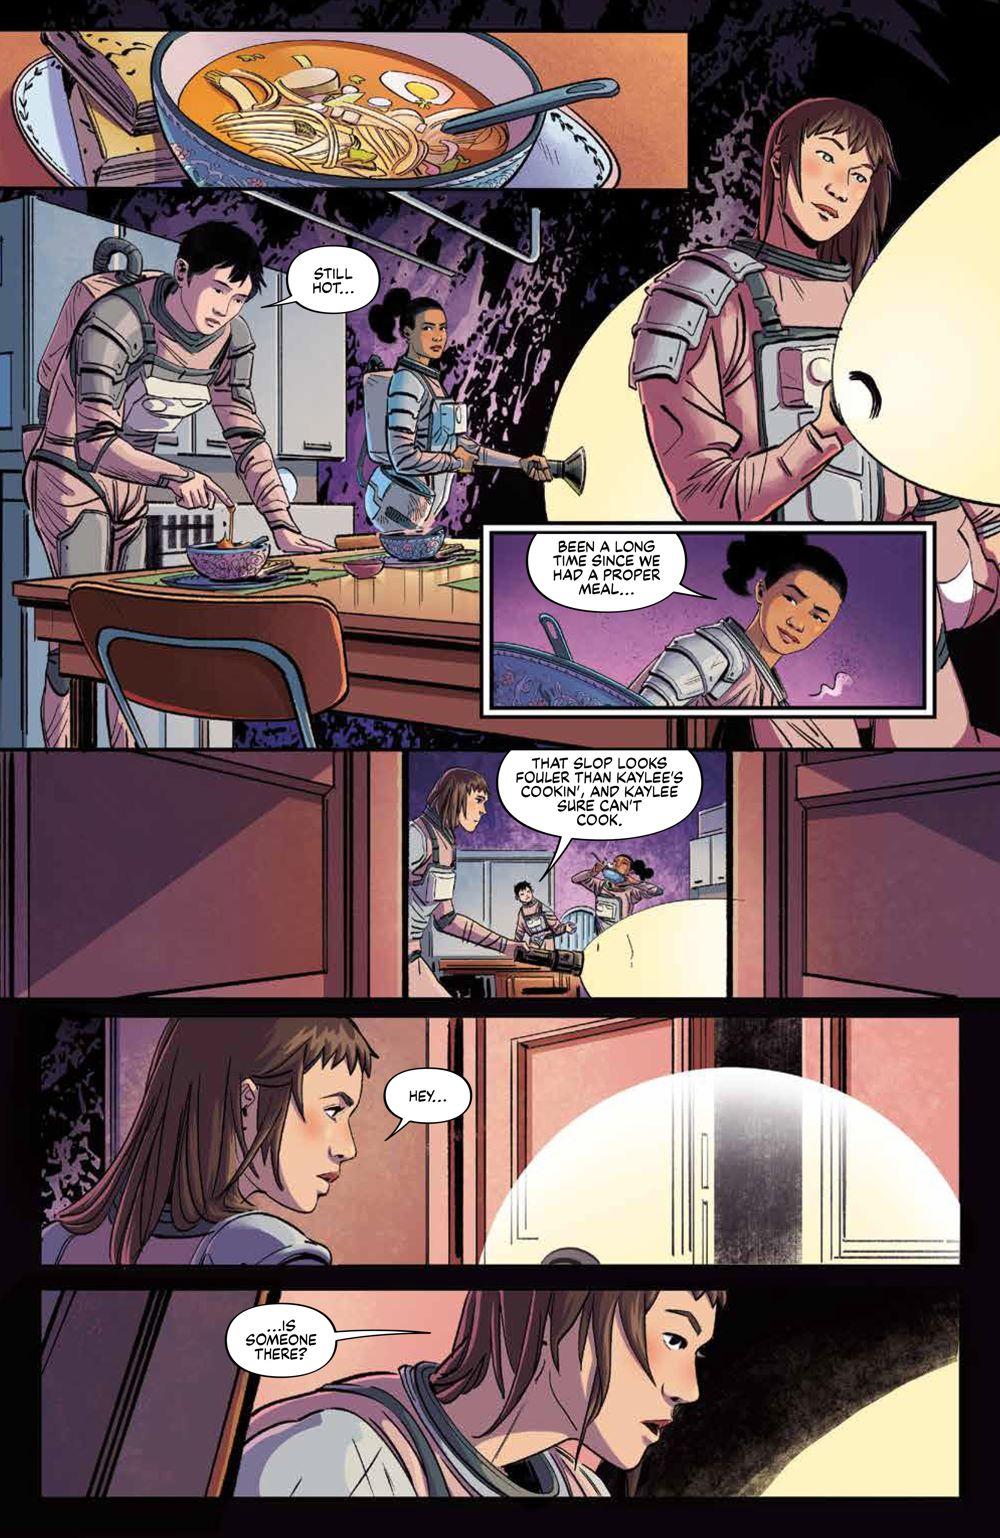 Firefly_BrandNewVerse_005_PRESS_4 ComicList Previews: FIREFLY BRAND NEW 'VERSE #5 (OF 6)